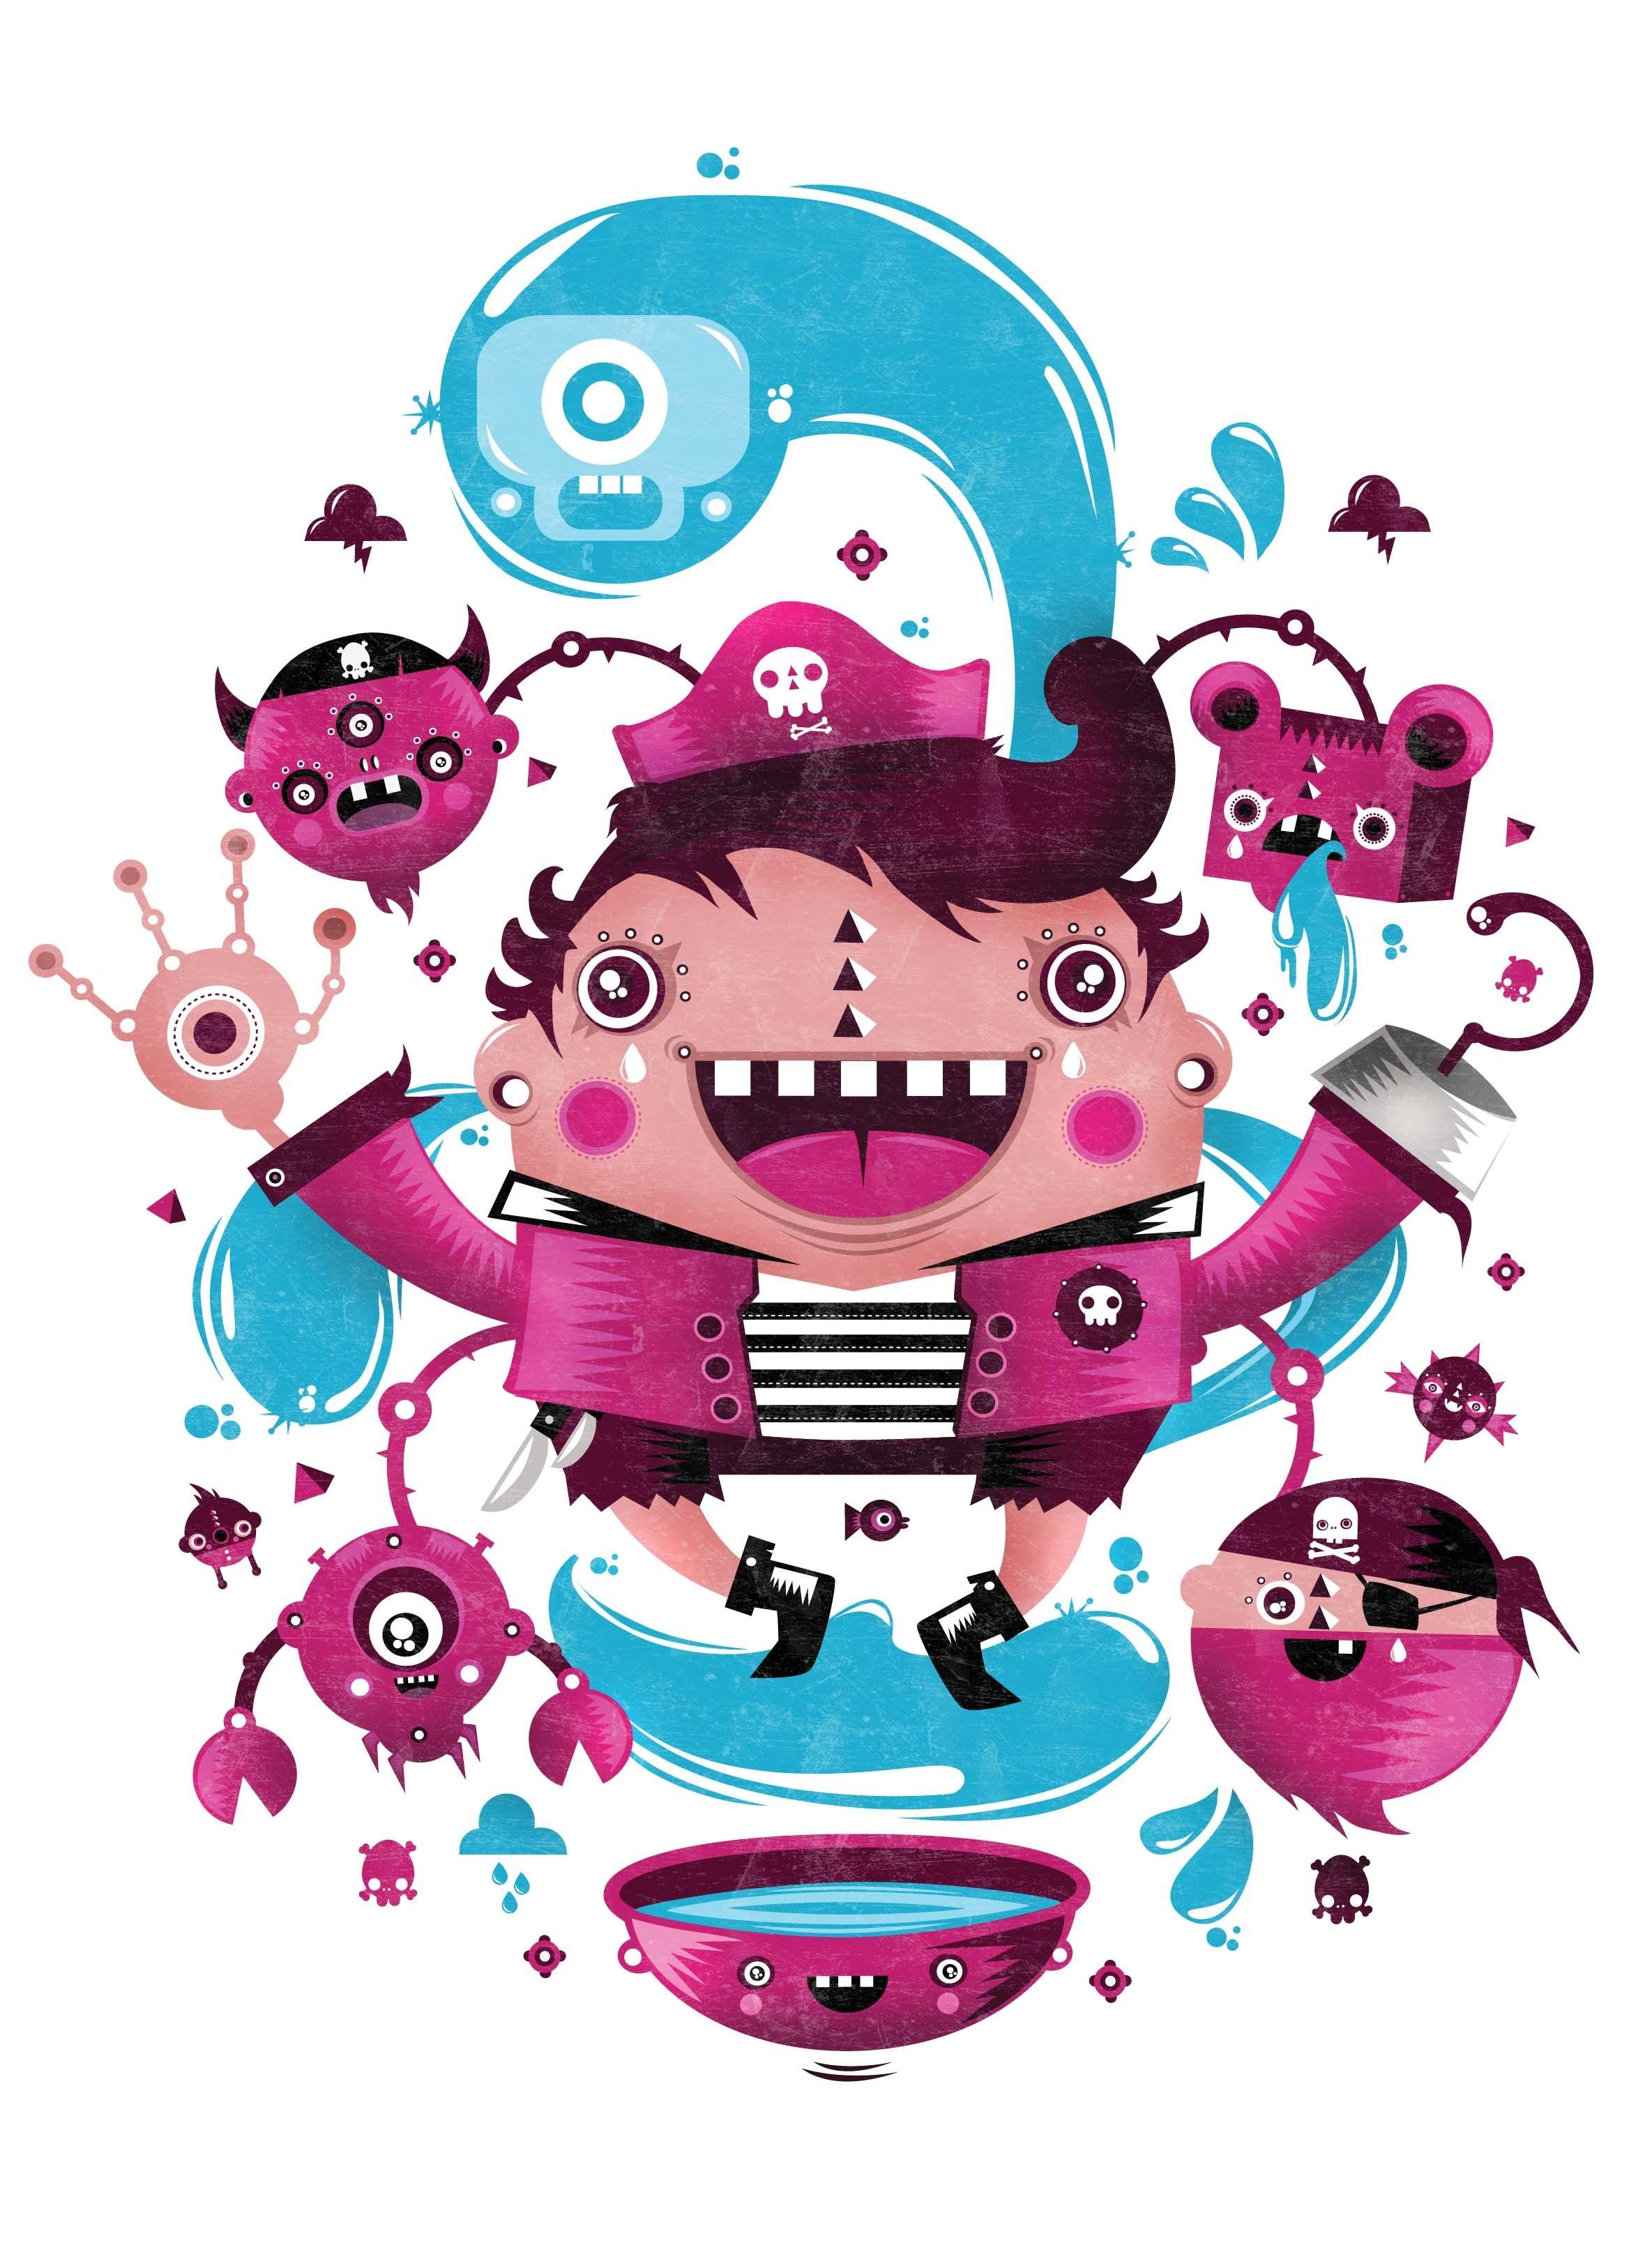 Adobe illustrator photoshop tutorial create cartoon figures with adobe illustrator photoshop tutorial create cartoon figures with ease digital arts baditri Gallery